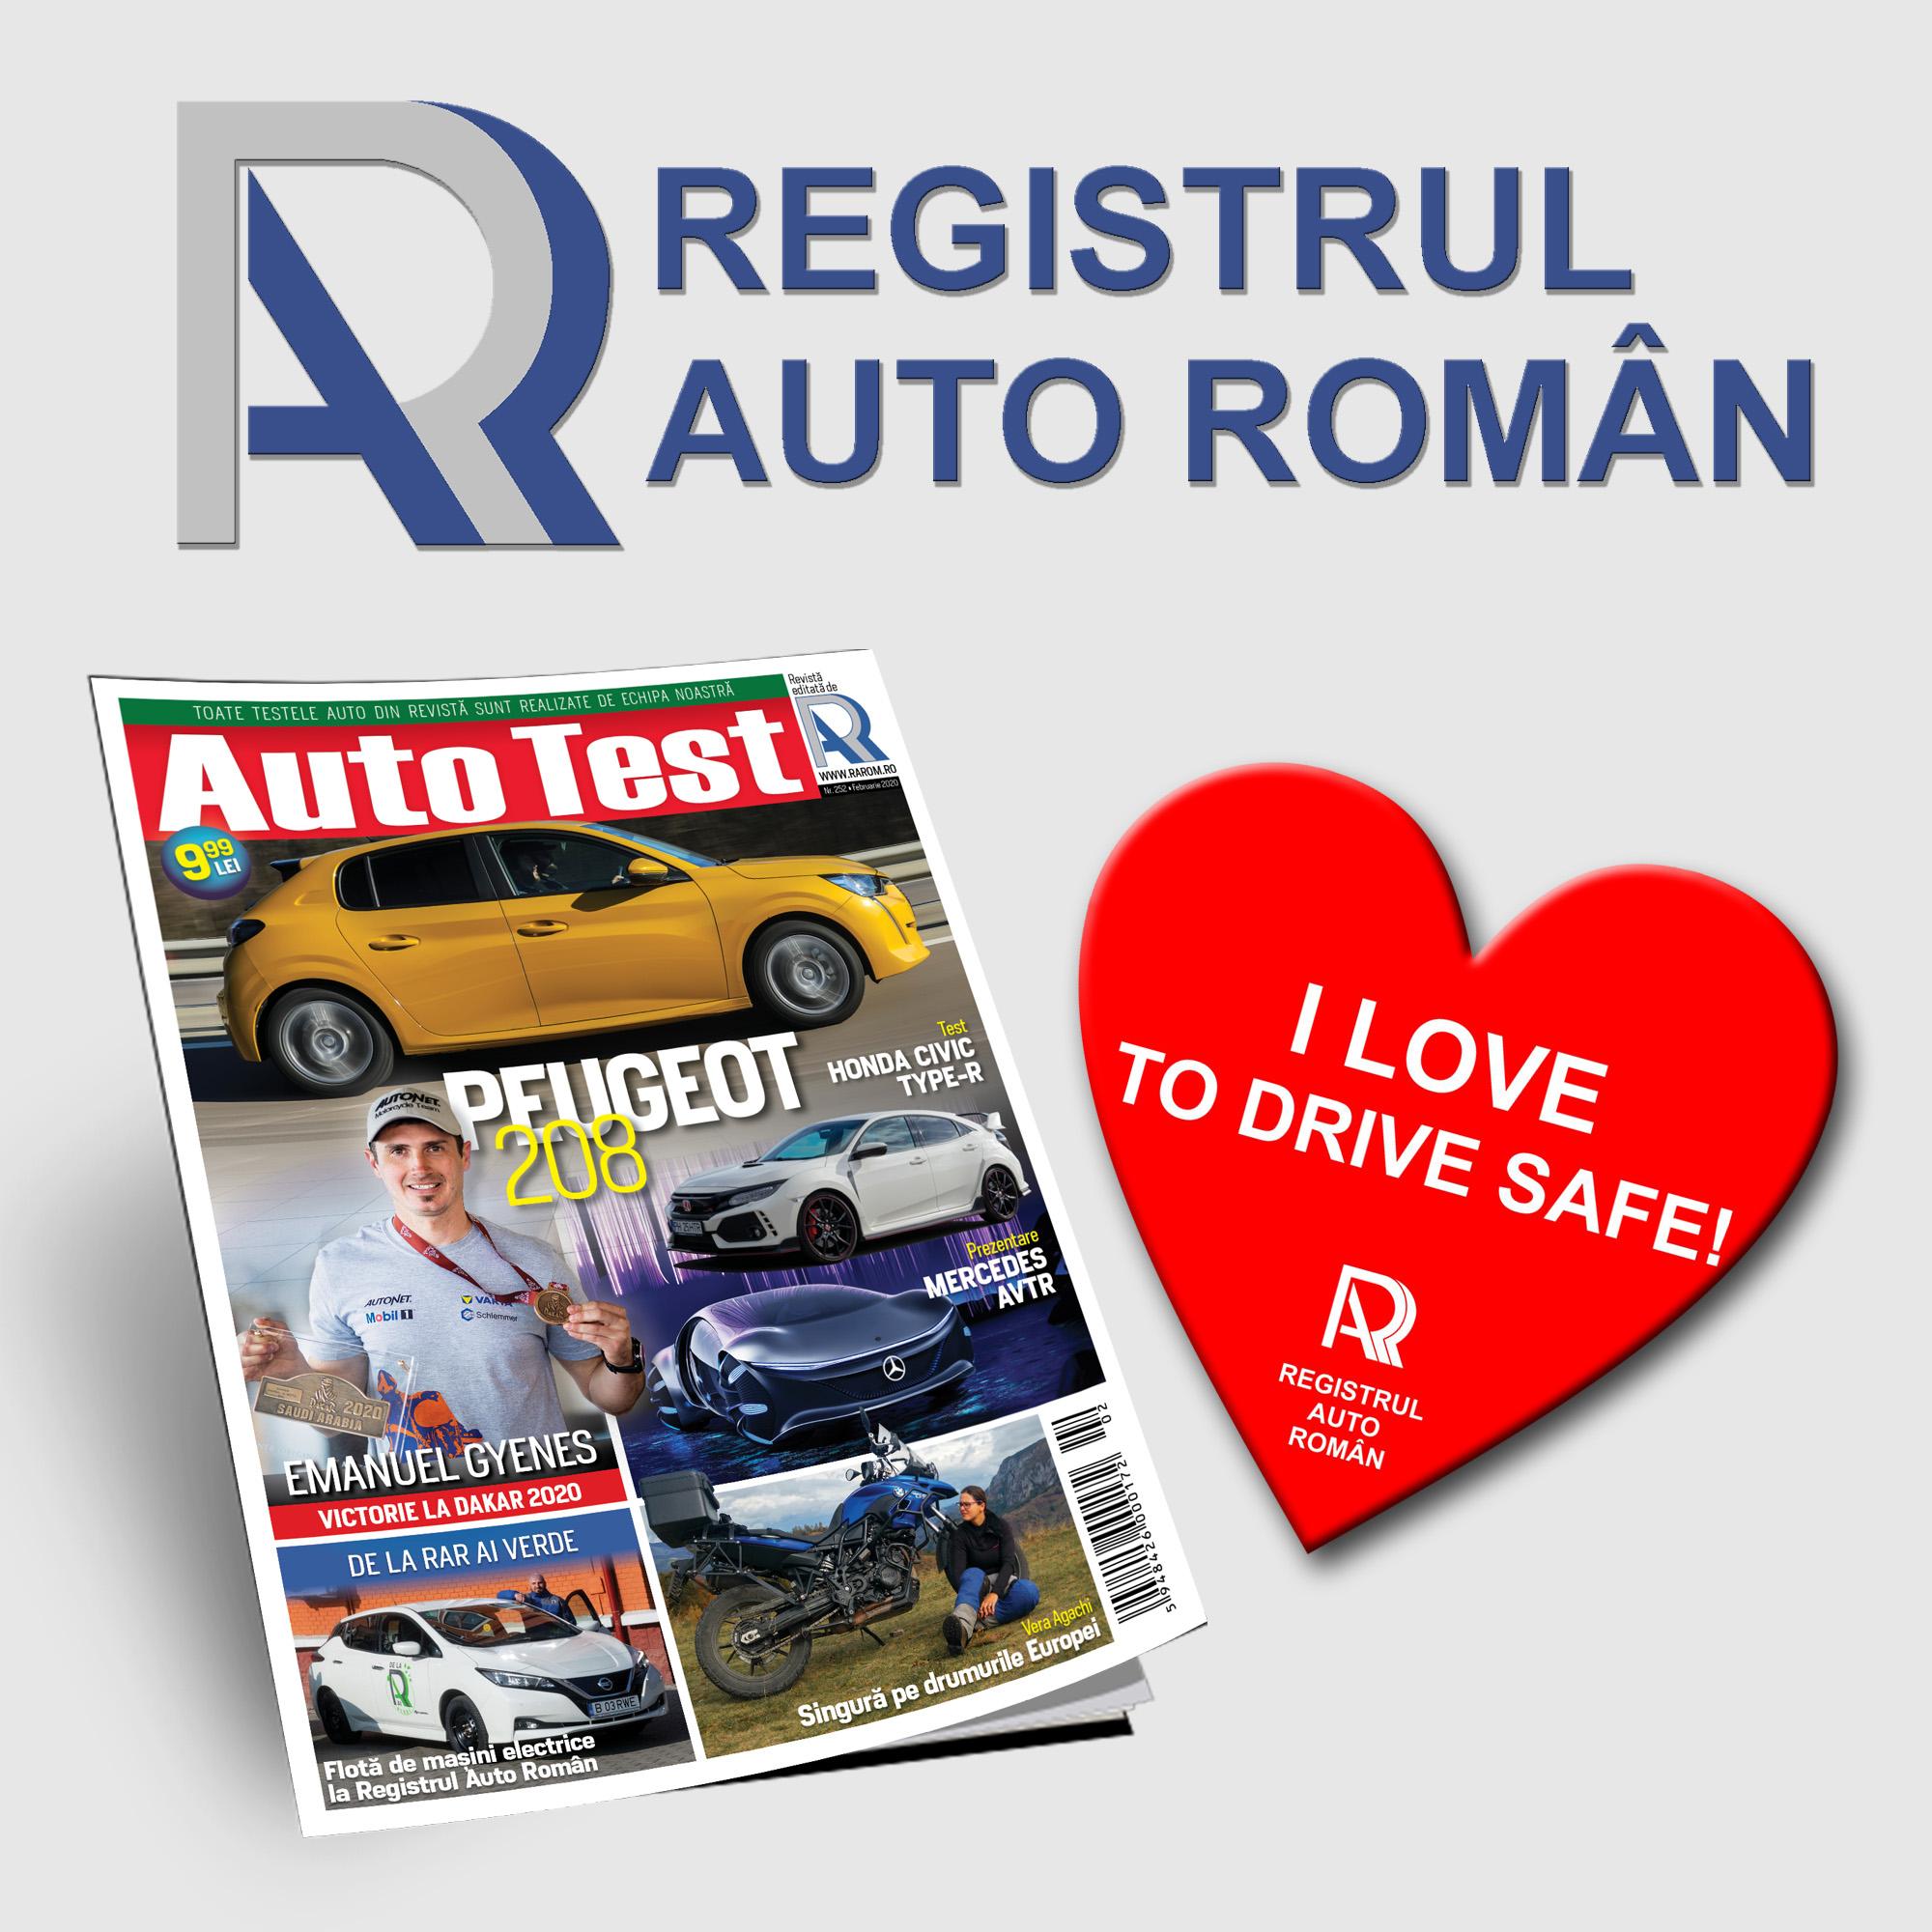 AutoTest MagazinAuto Test Februarie 2020: I LOVE TO DRIVE